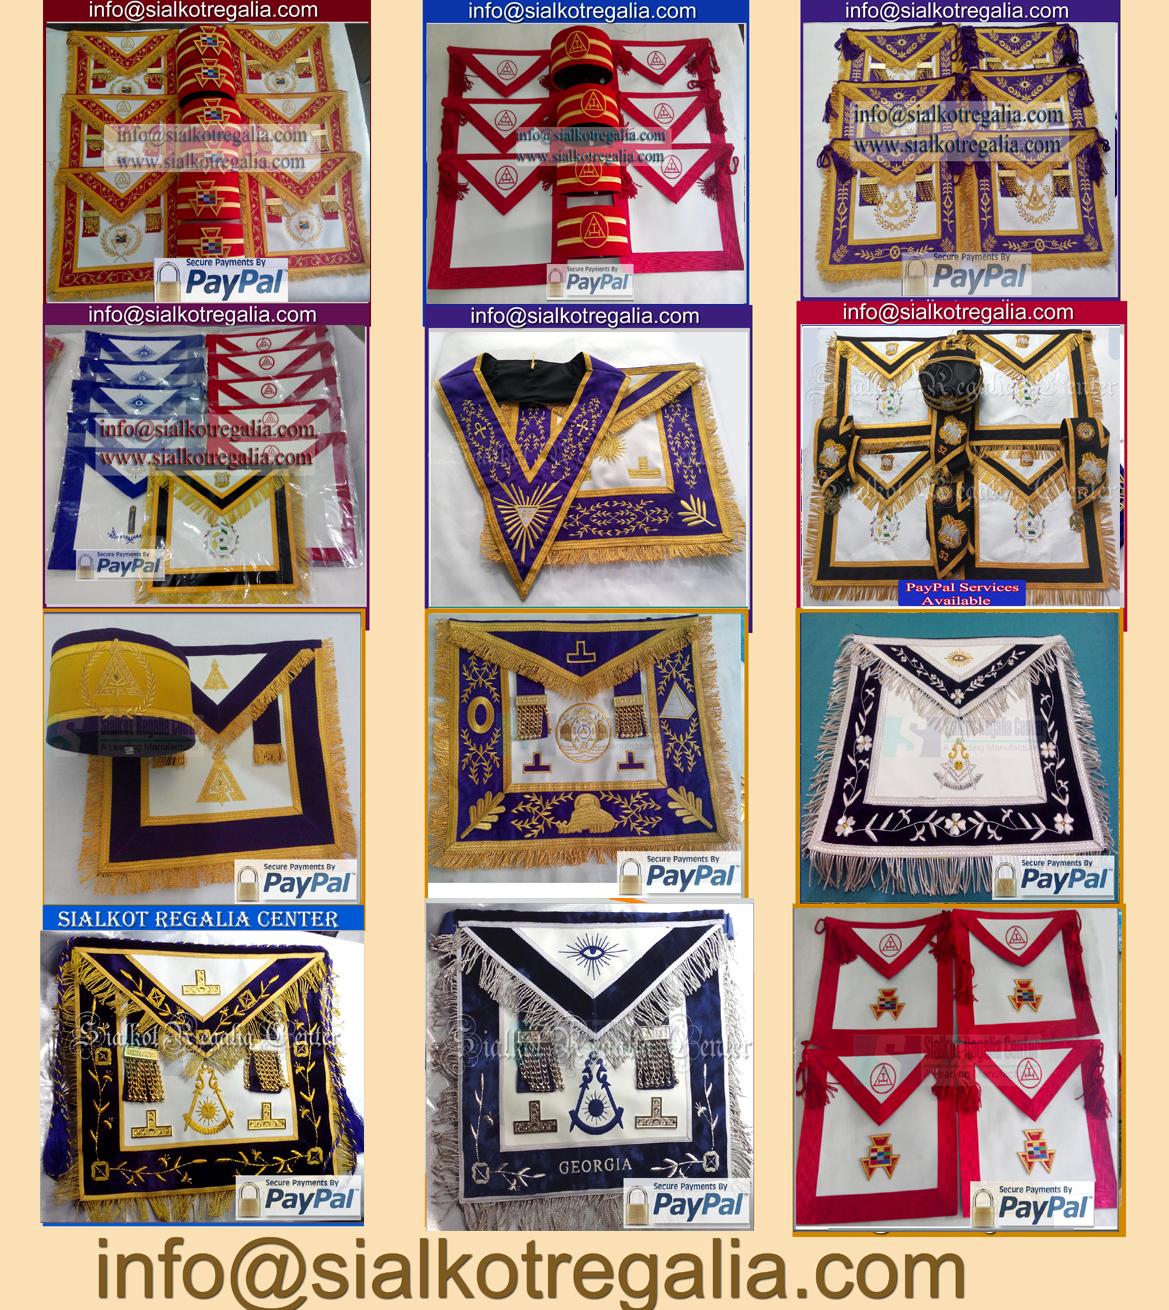 Sialkot Regalia Center : Masonic Working Tools Apron